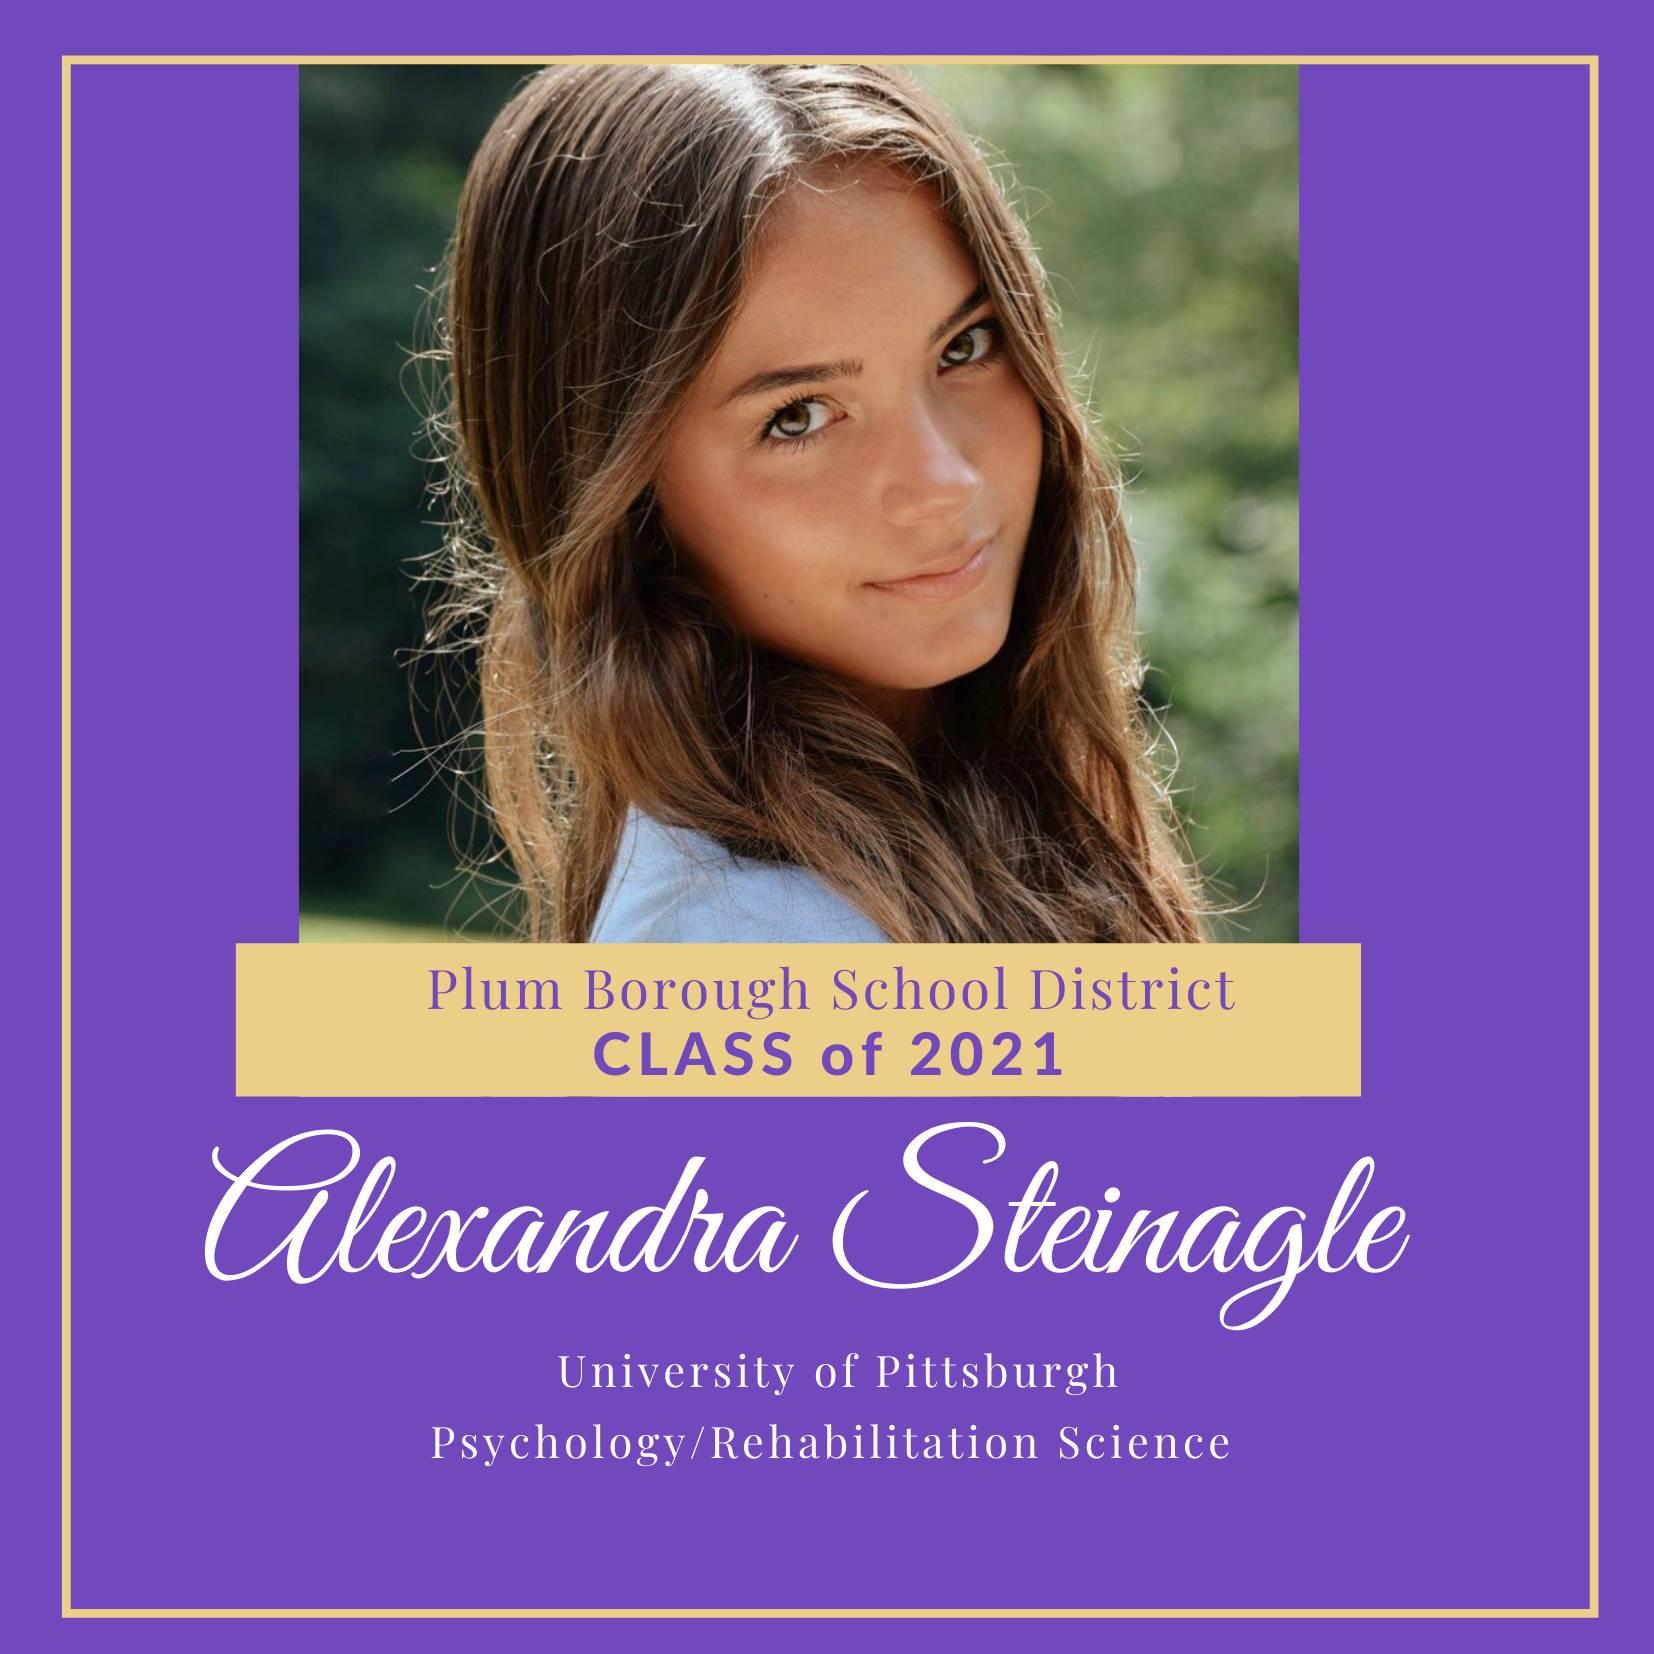 Congratulations to Alexandra Steinagle, Class of 2021!